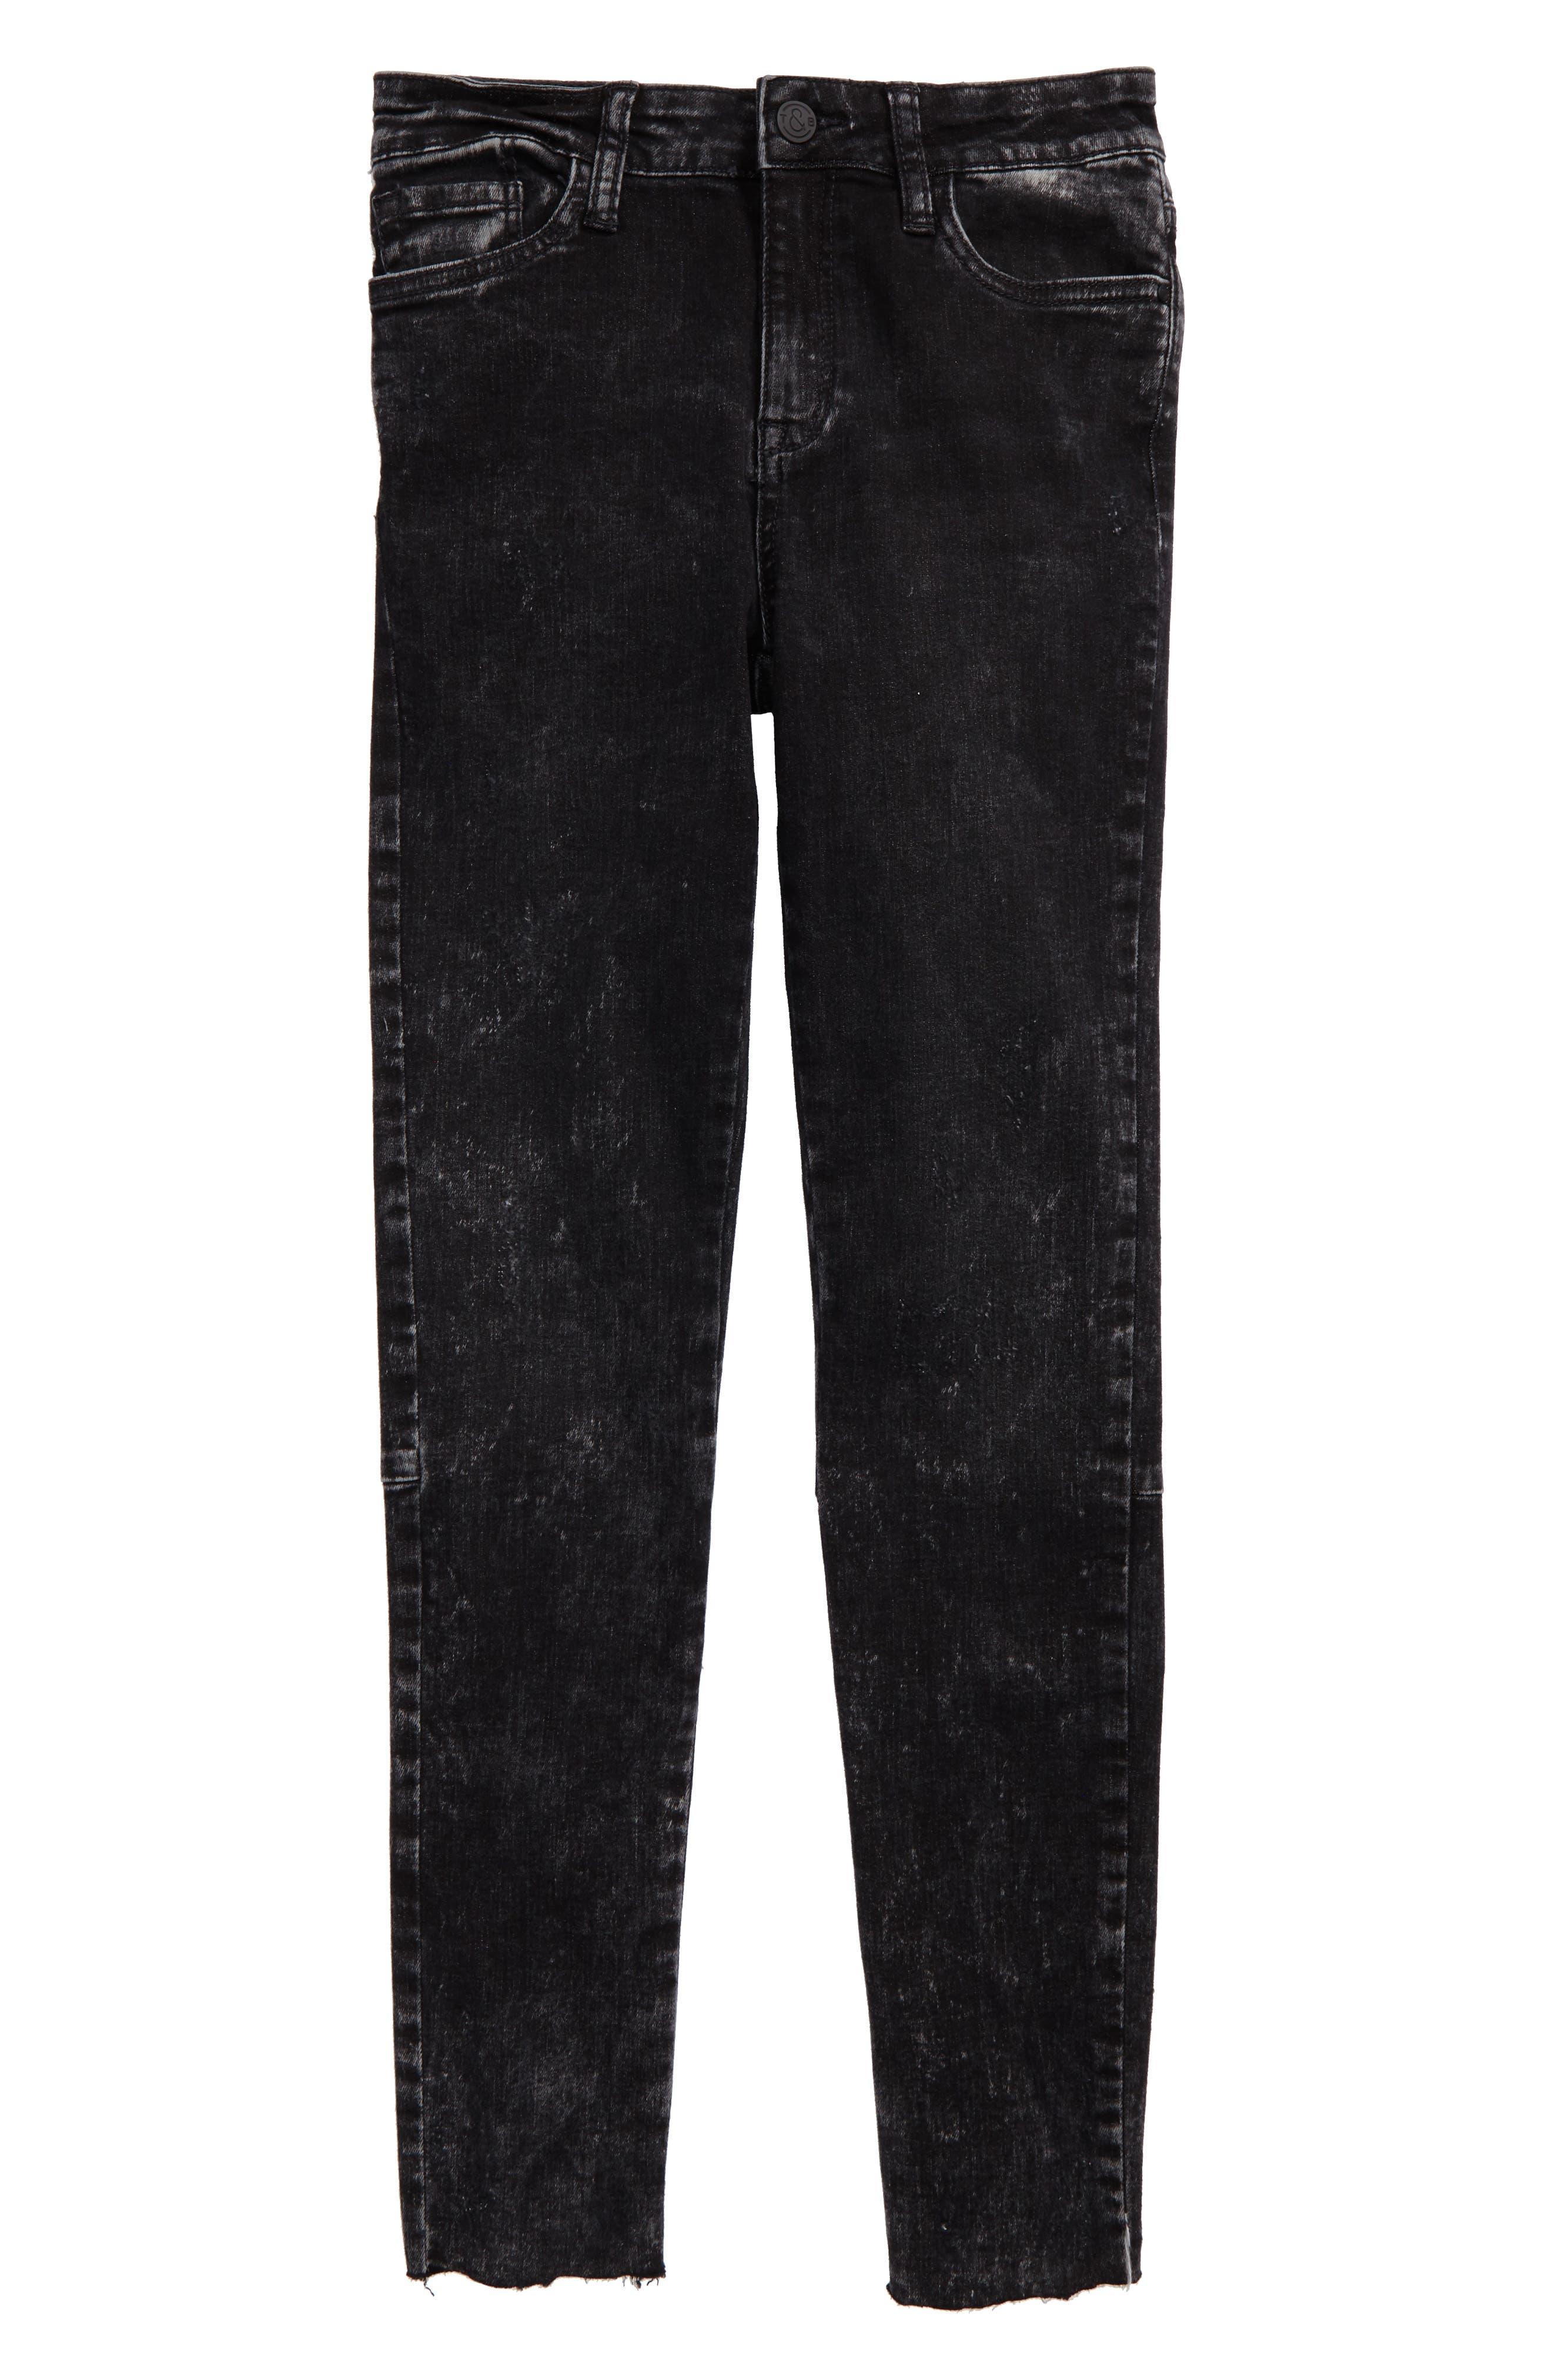 Treasure & Bond Acid Wash Skinny Jeans (Big Girls)